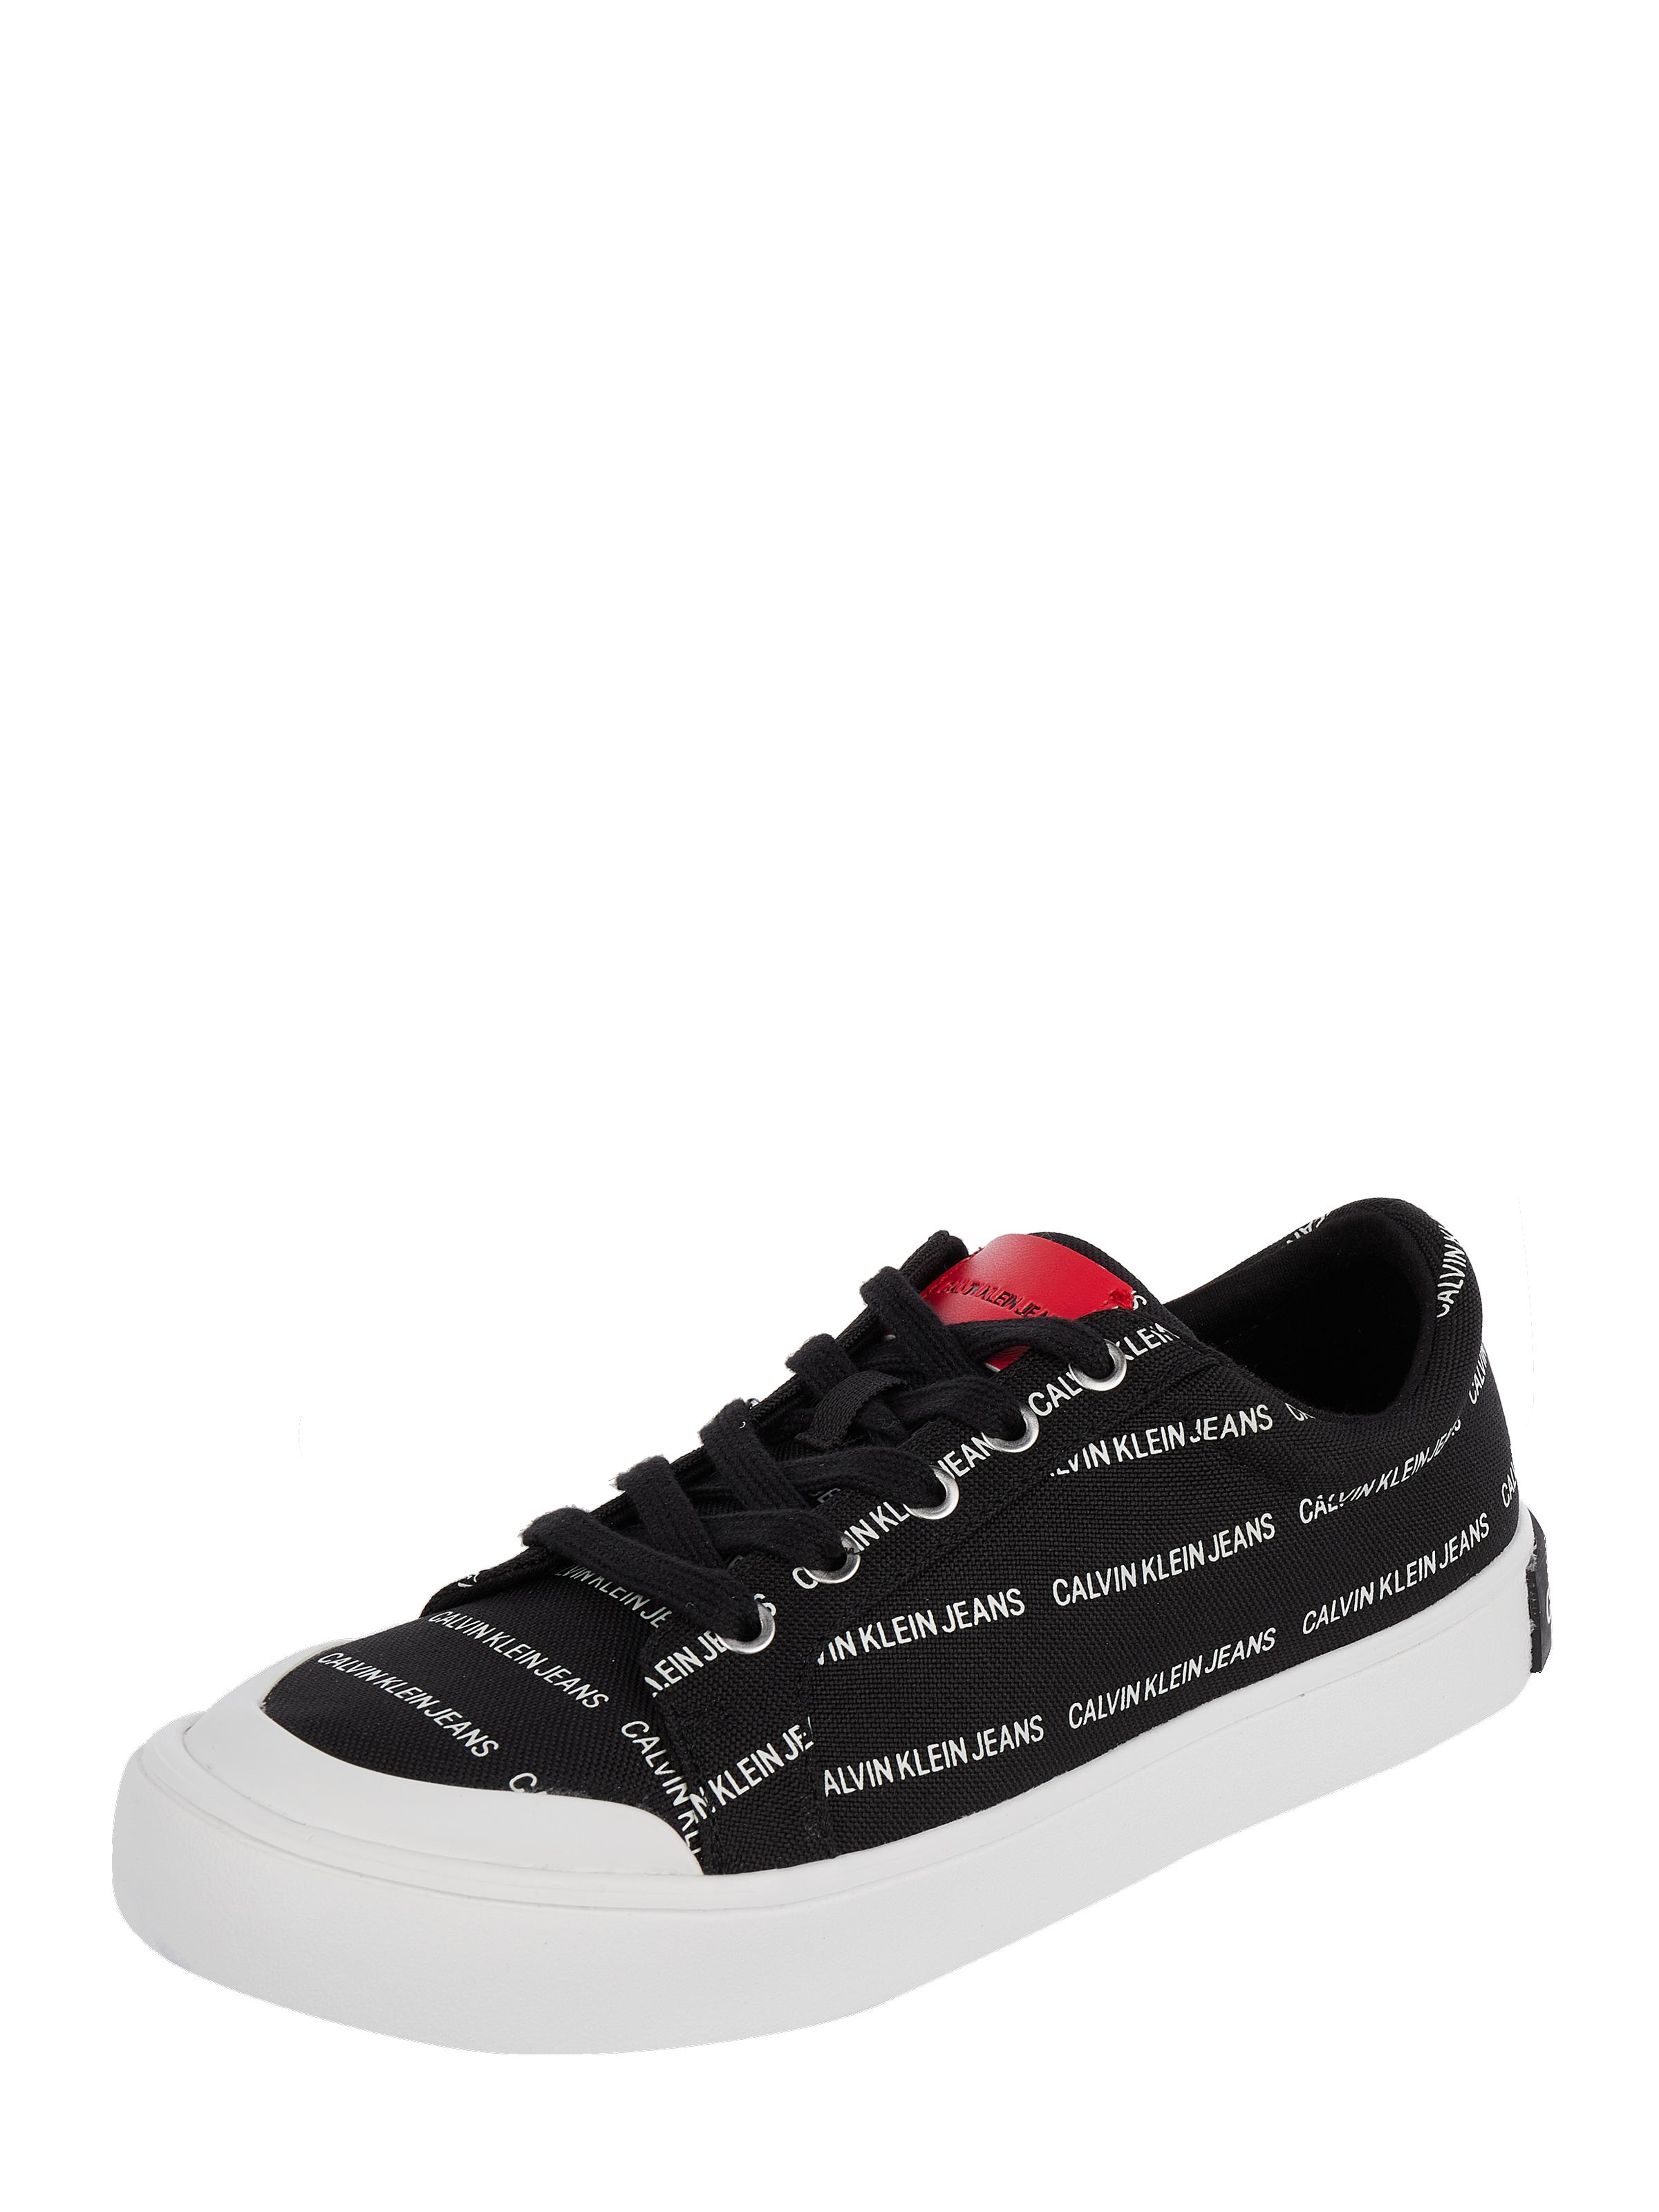 "Calvin Klein Jeans – Sneakersy ""Domezia"" płócienne – Czarny"